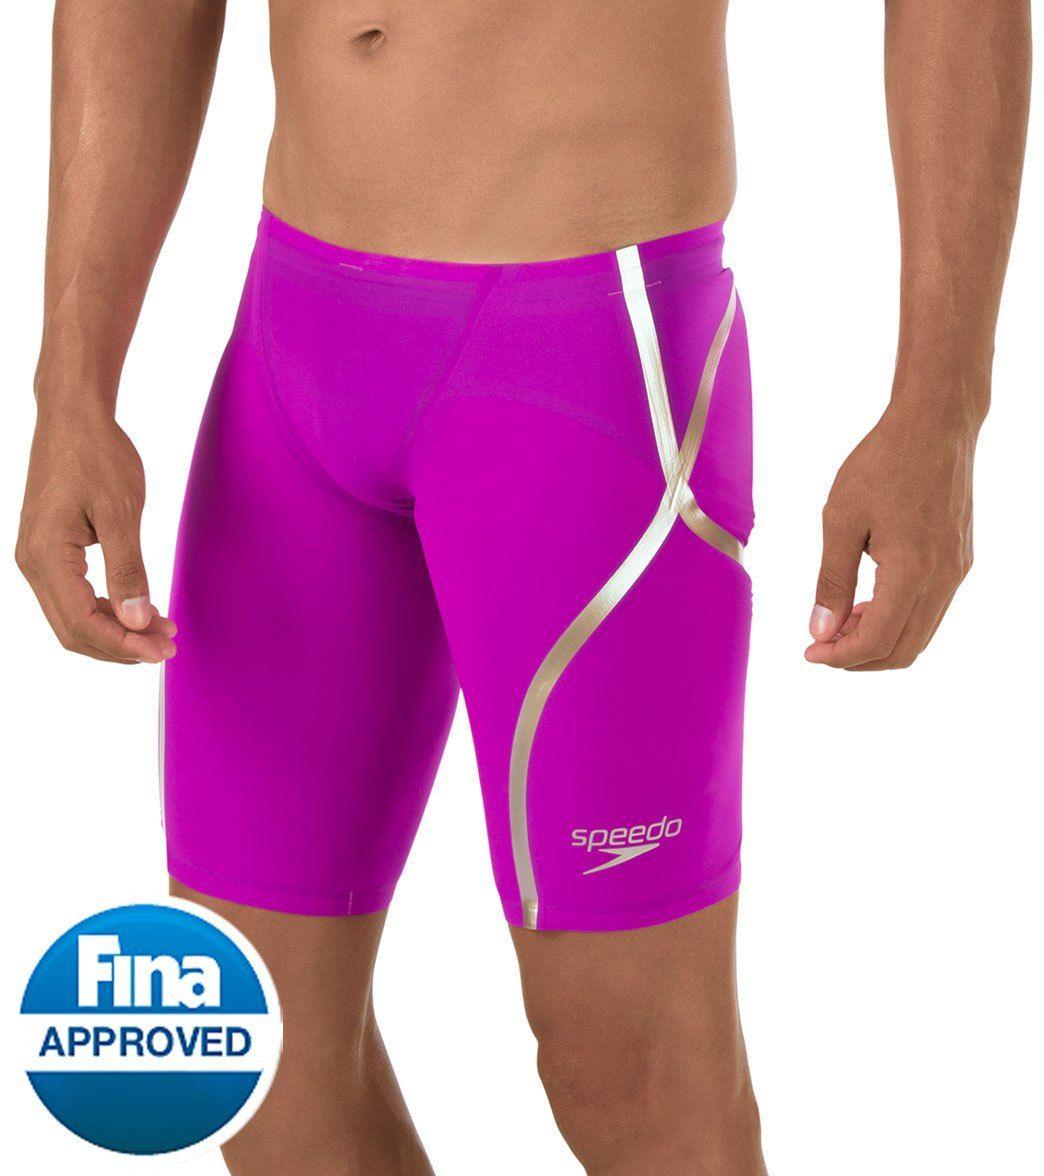 Speedo Men s LZR Racer X Jammer Tech Suit Swimsuit  6e742a837